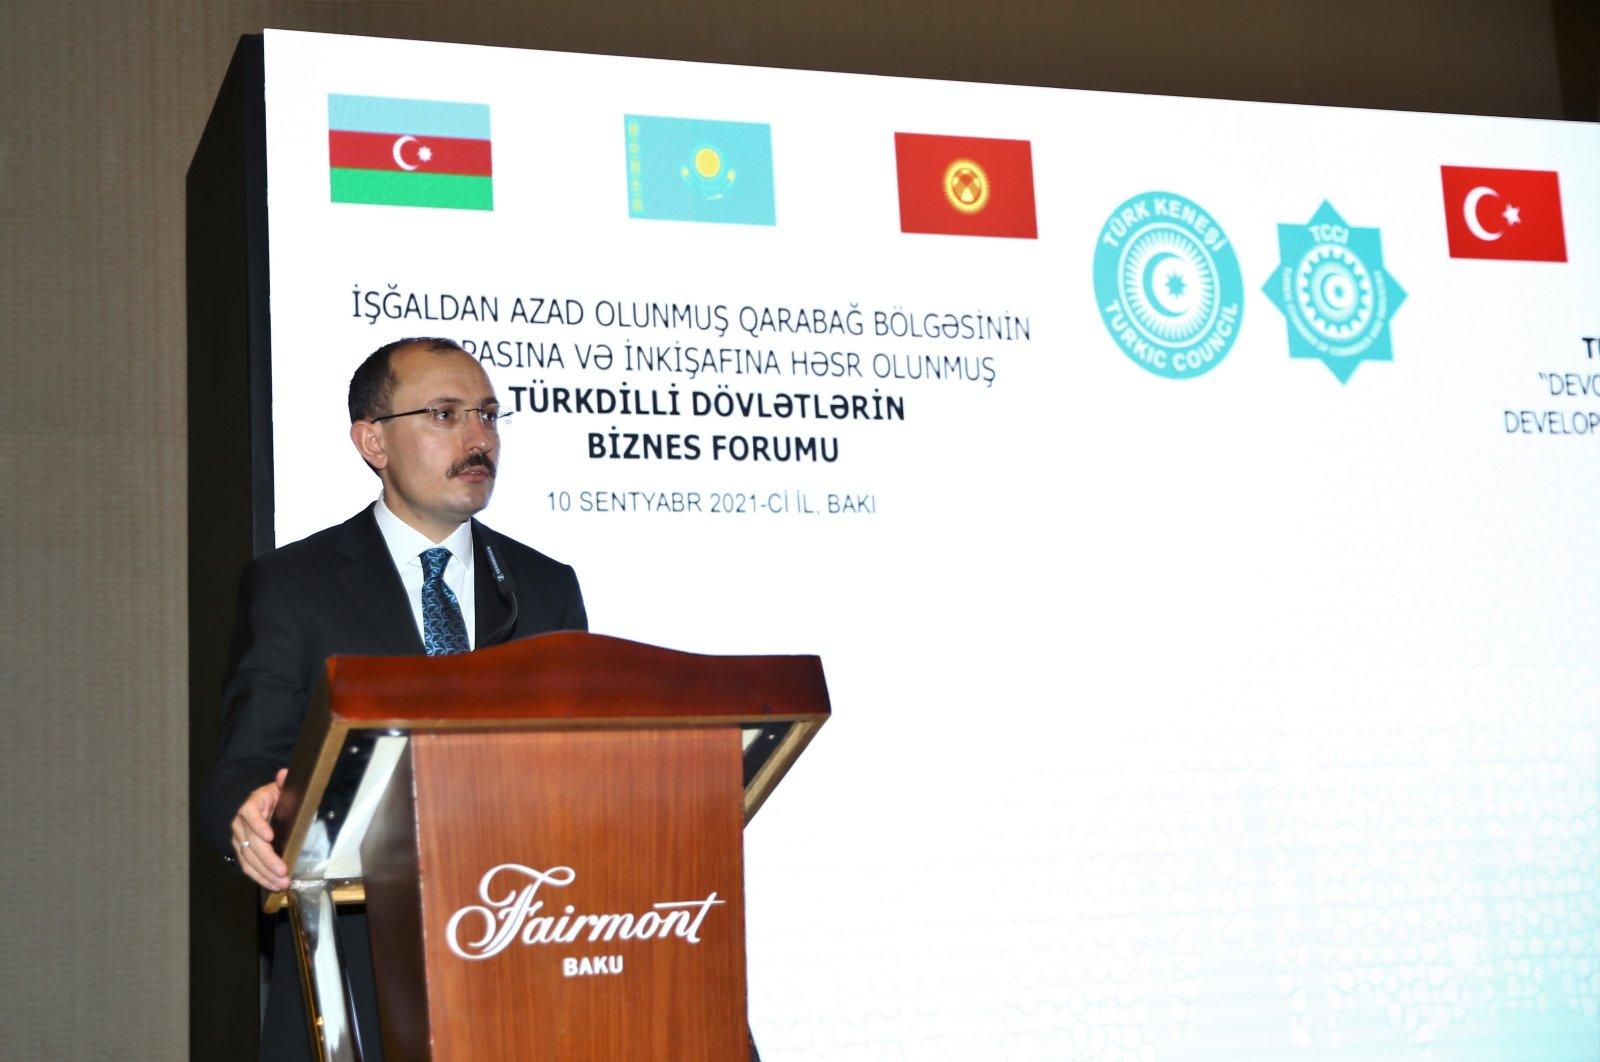 Turkish Trade Minister Mehmet Muş speaks during a business forum in Baku, Azerbaijan, Sept. 10, 2021. (AA Photo)